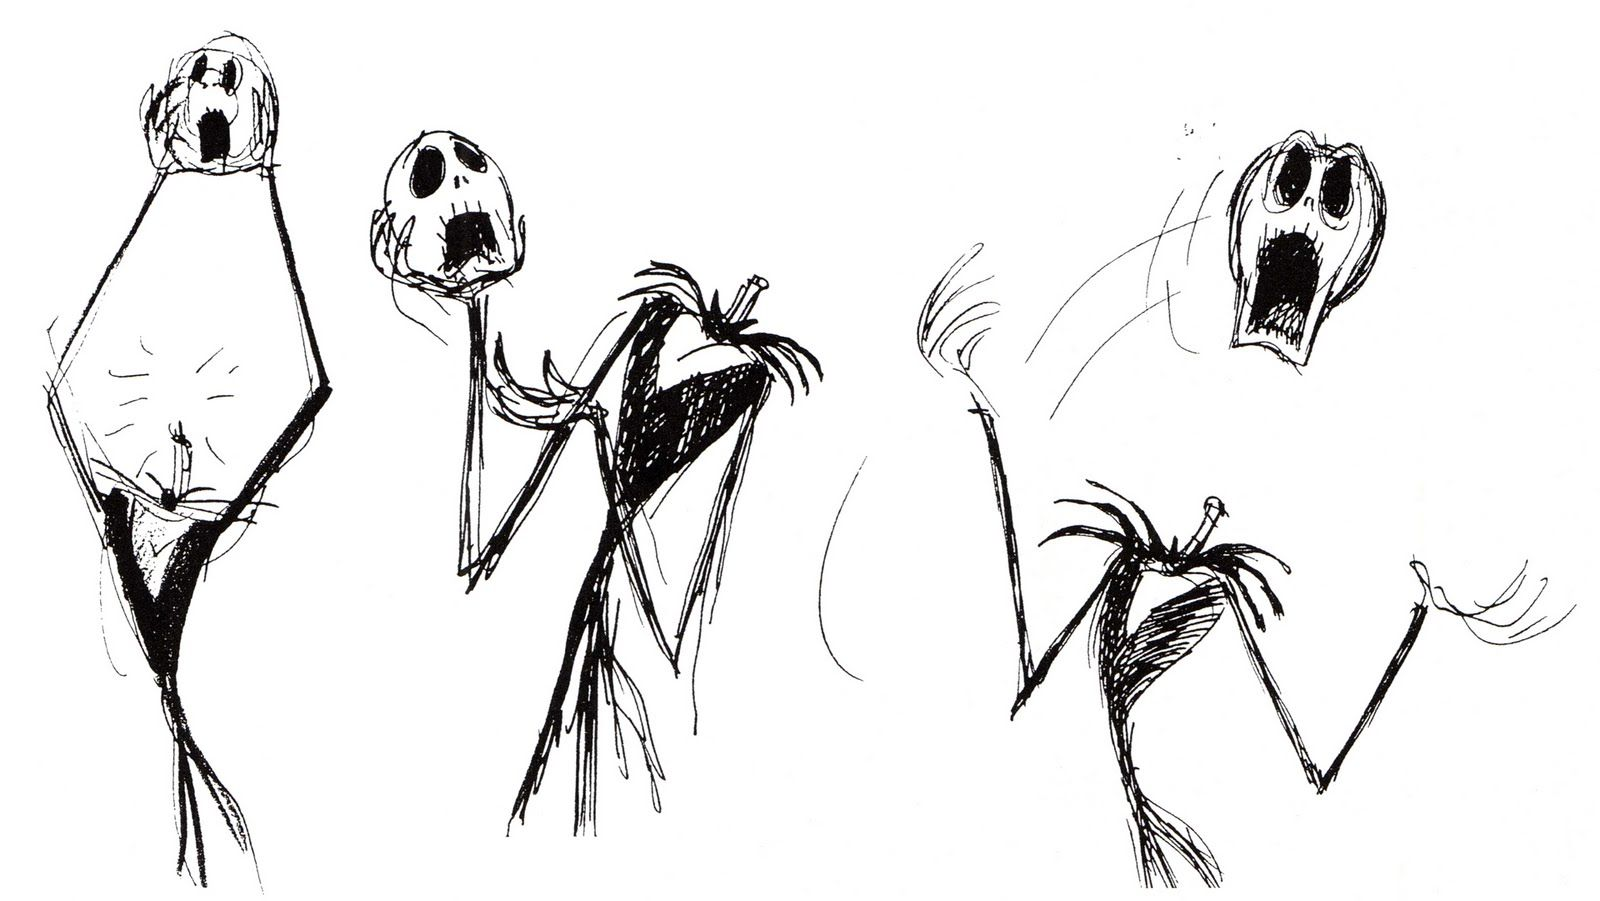 Concept art of Jack Skellington headless